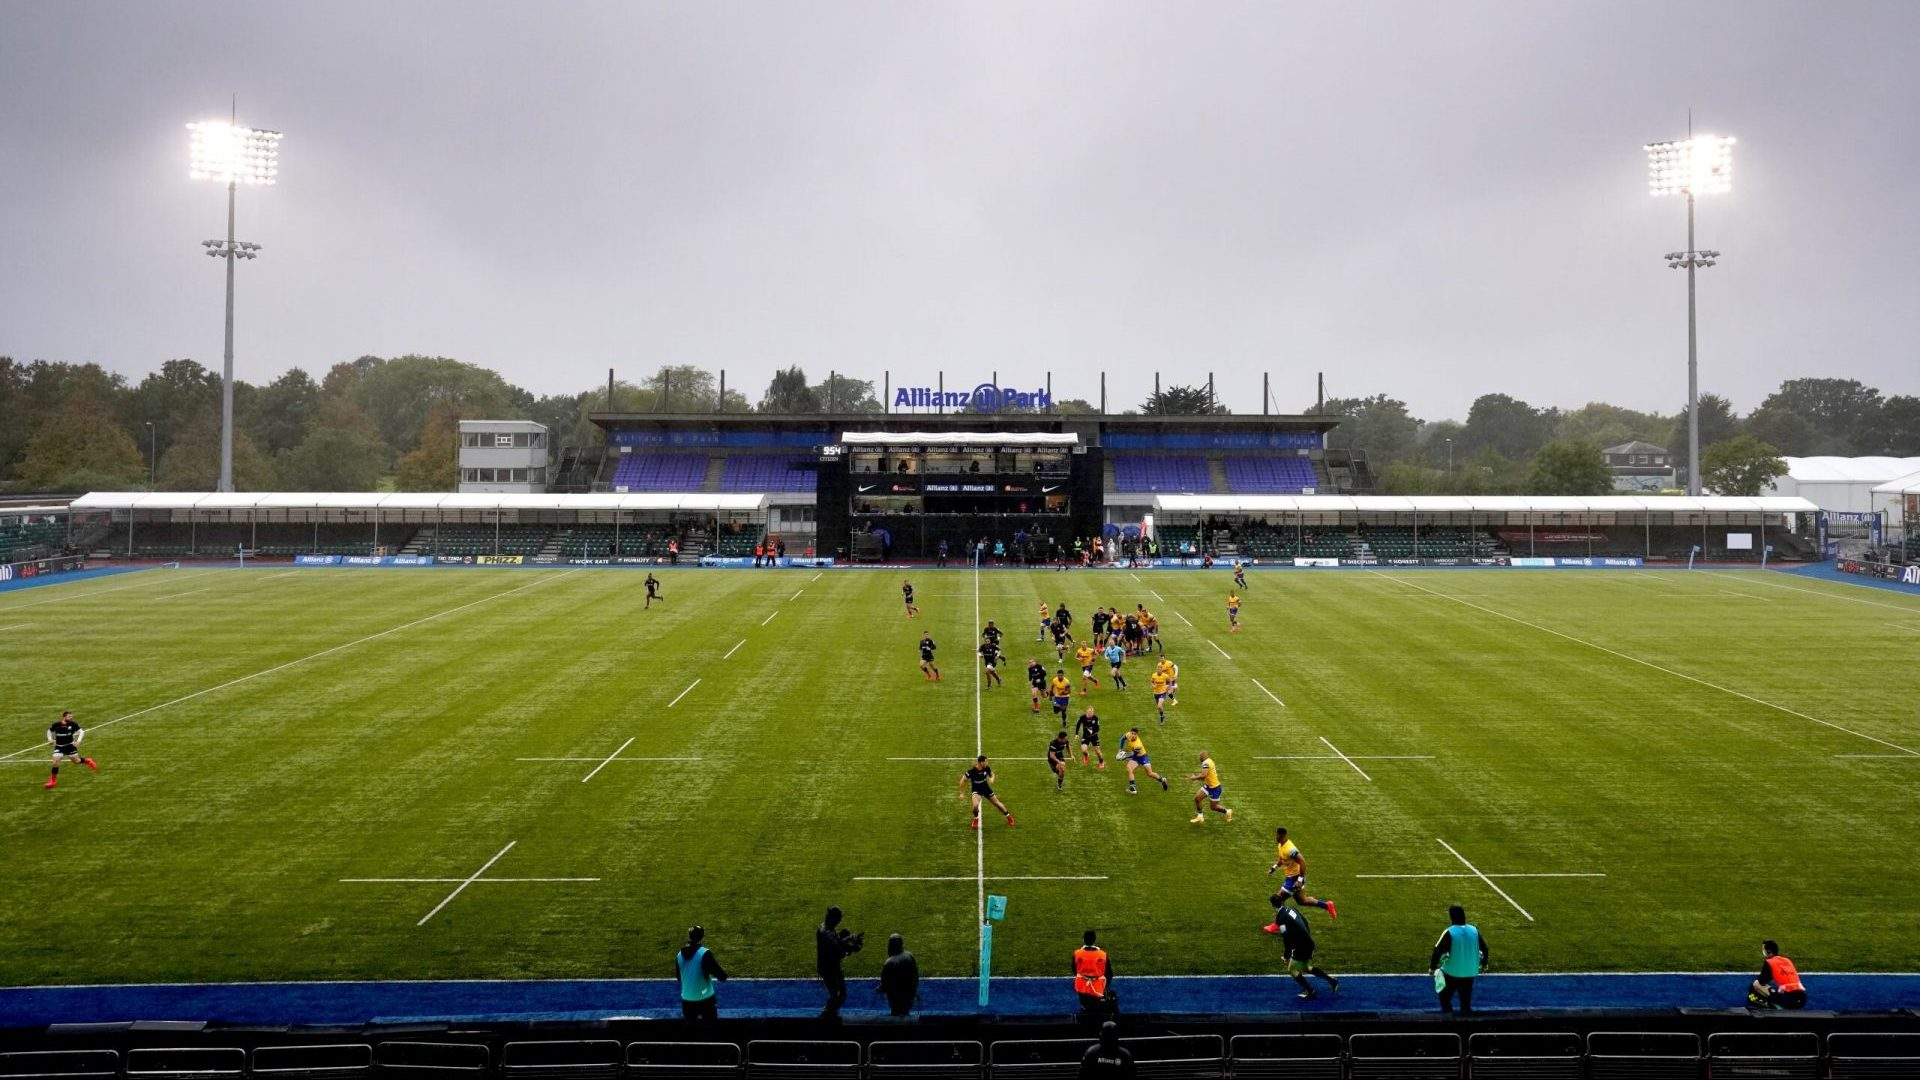 Saracens issue statement confirming stadium name change